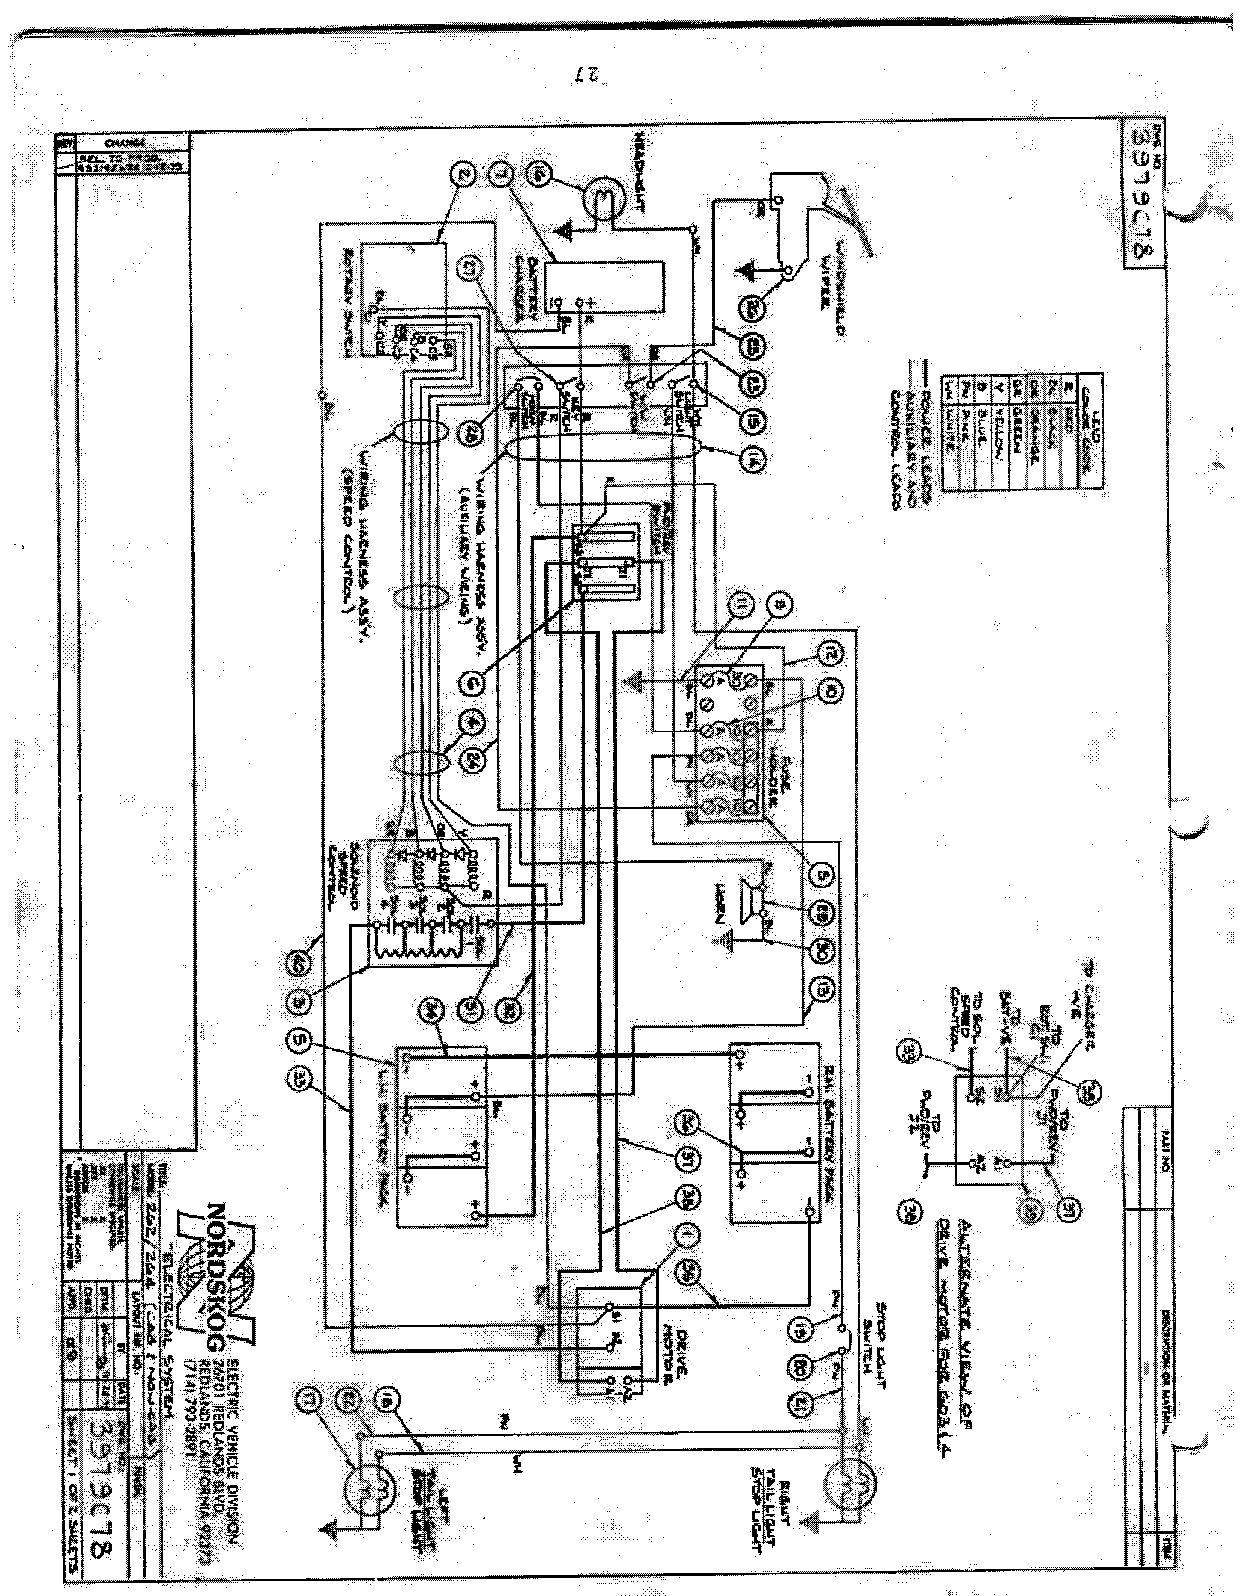 MM_2825] Vintage Golf Cart Wiring Diagram Club Car Wiring DiagramAtolo Elinu Dimet Seve Mohammedshrine Librar Wiring 101